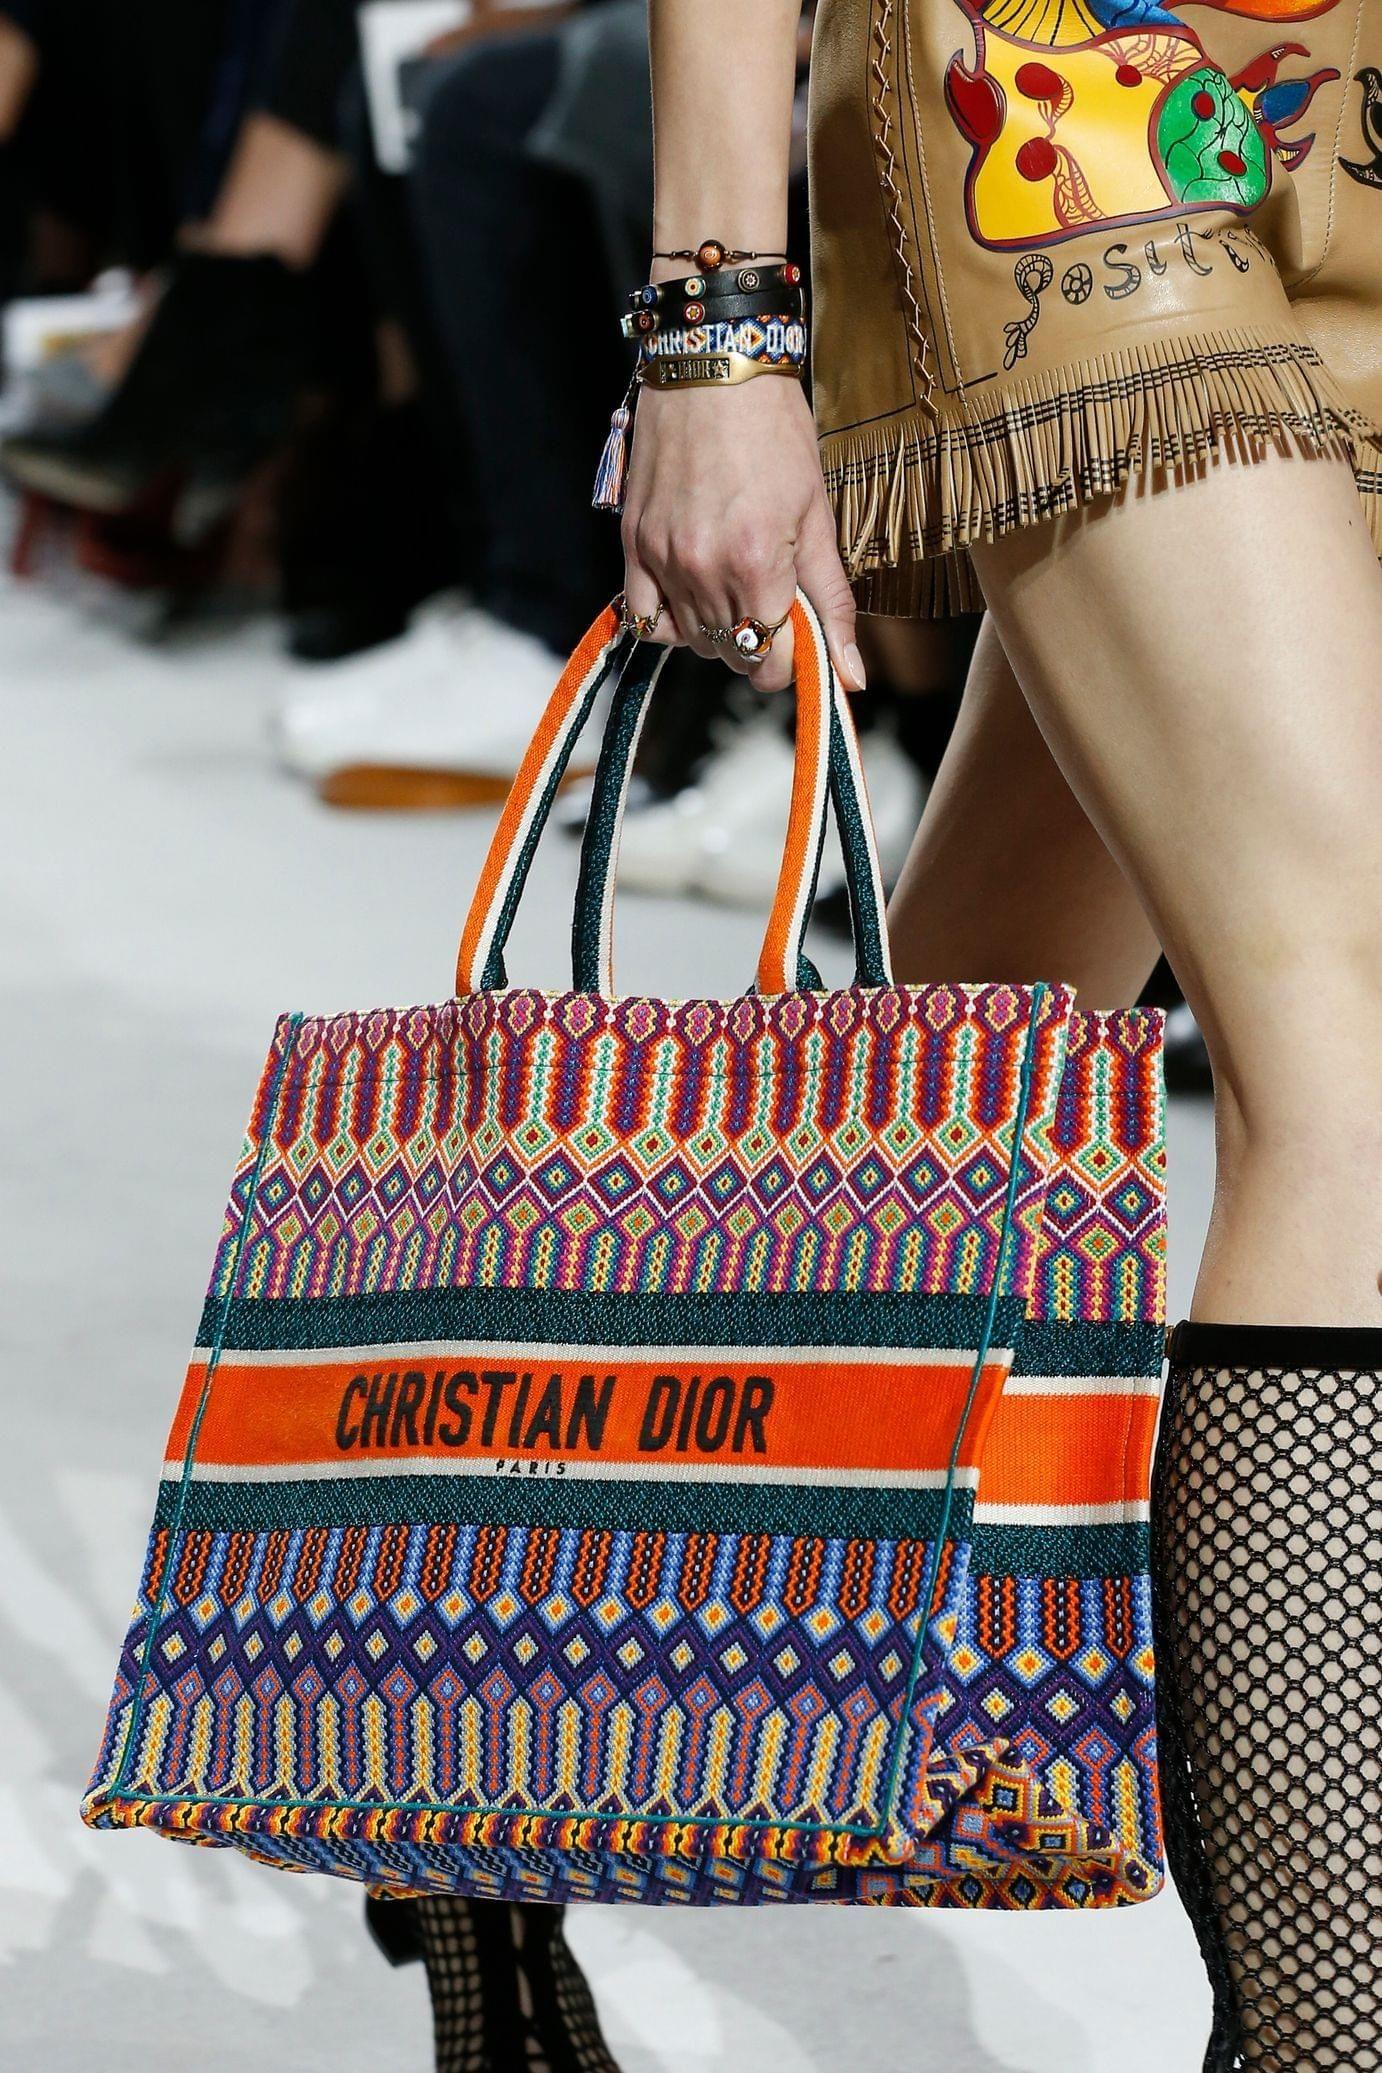 Christian Dior весна лето 2018 сумка с принтом